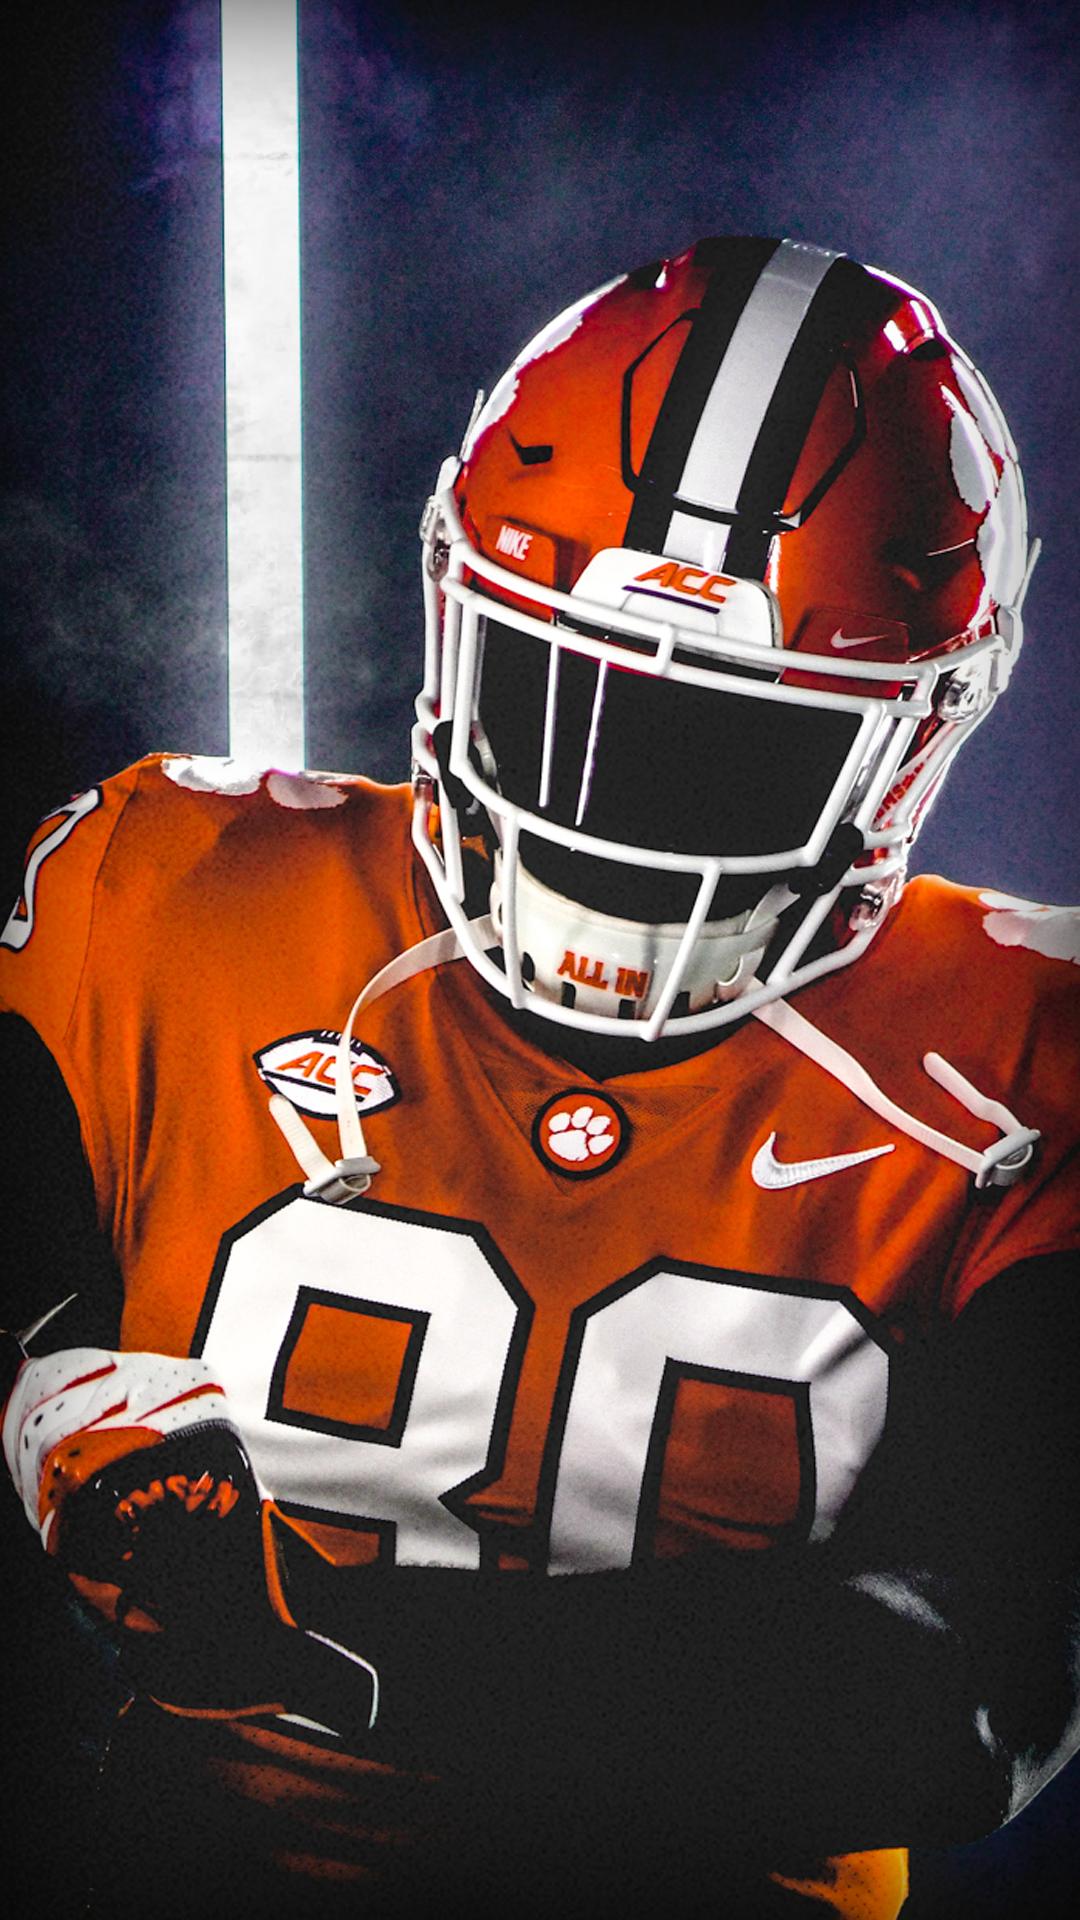 Clemson Football Iphone Wallpaper Androidfast25 En 2020